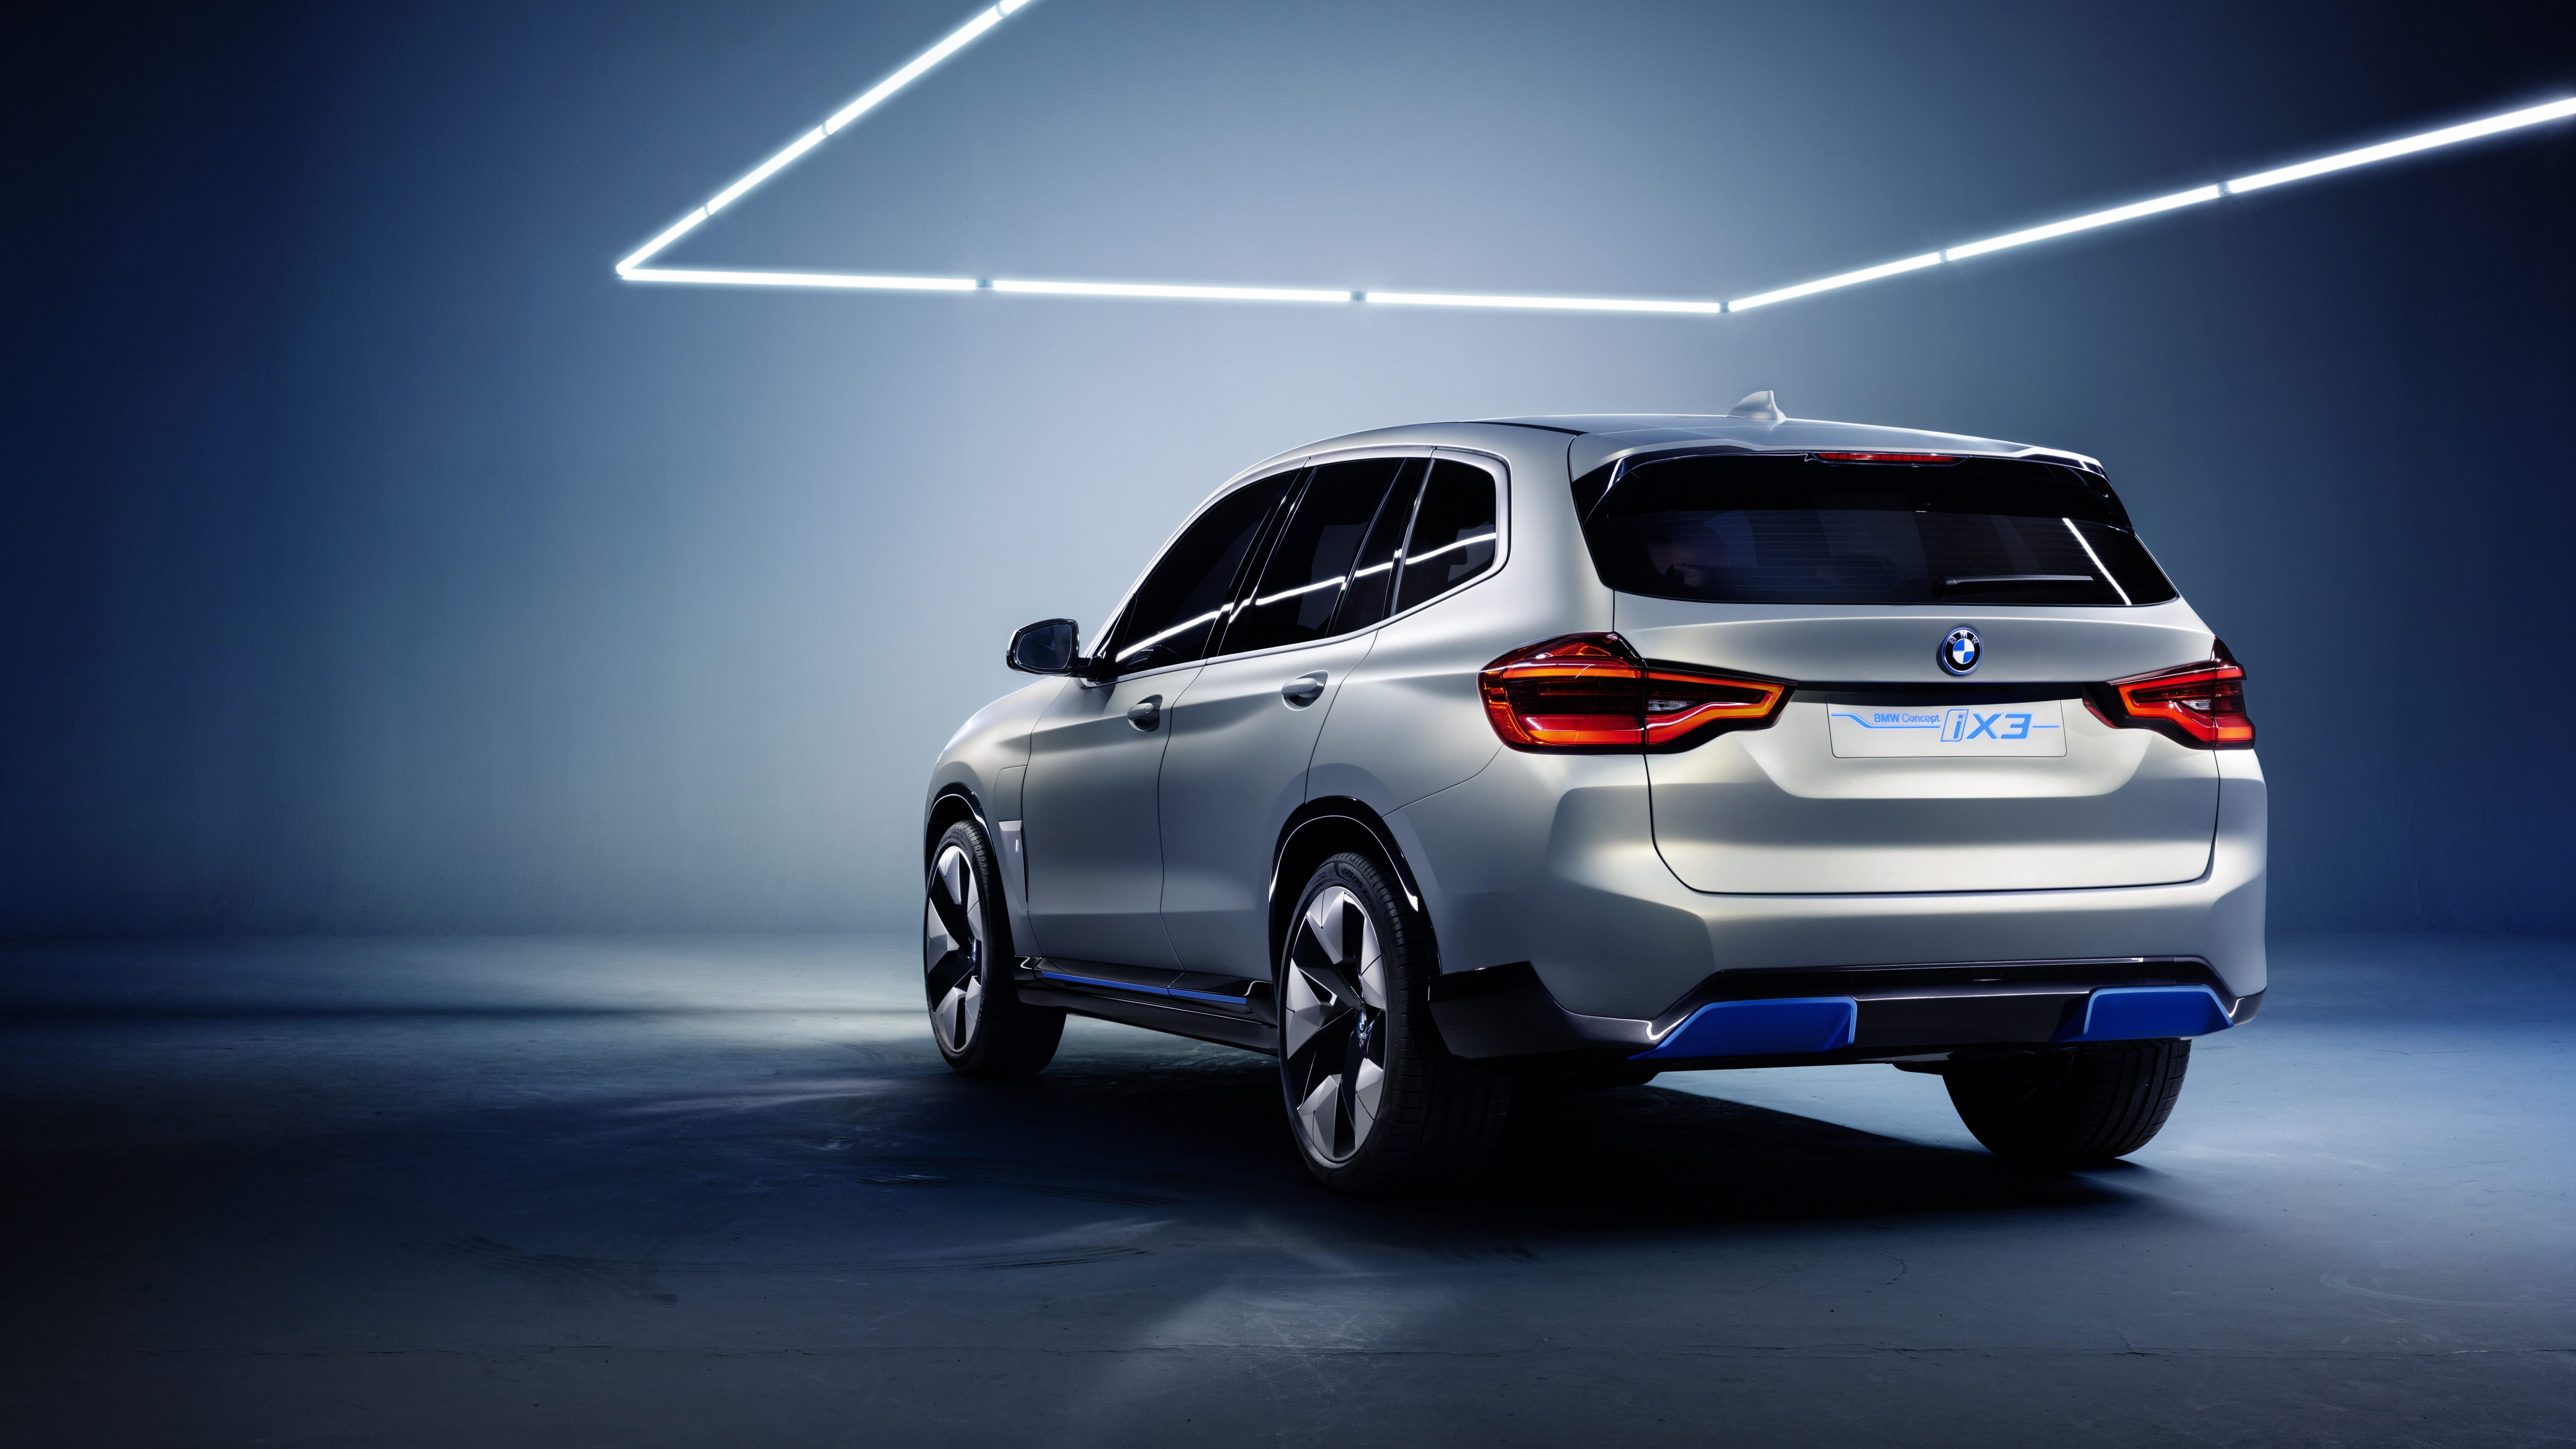 Wallpaper BMW iX3, electric cars, 8k, Cars & Bikes #18000